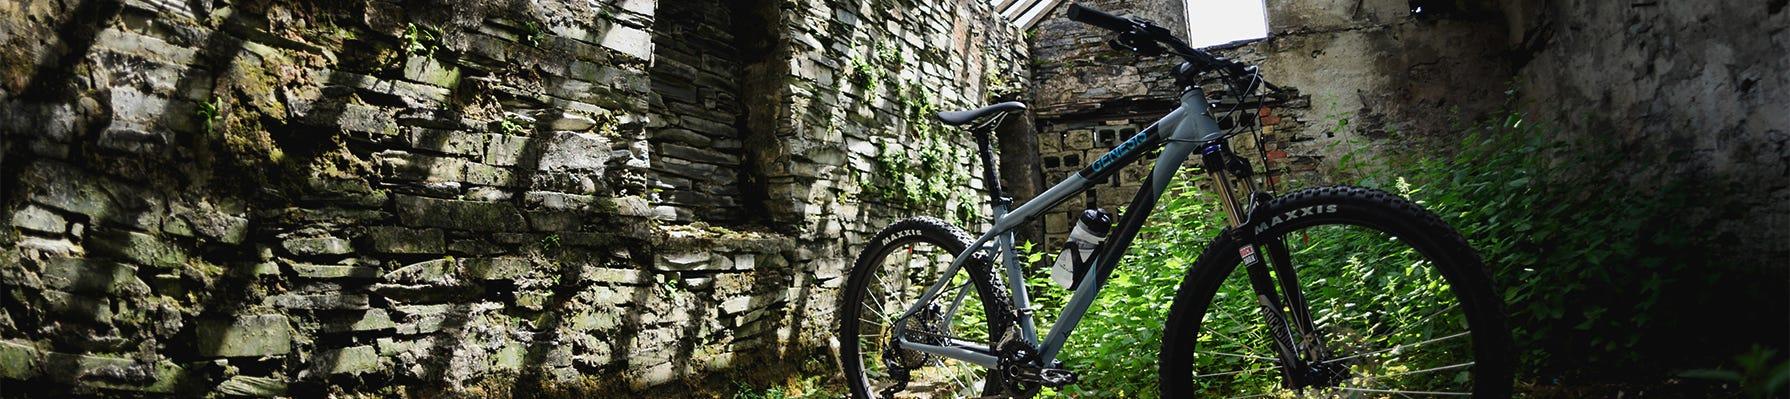 Cross Country Bikes